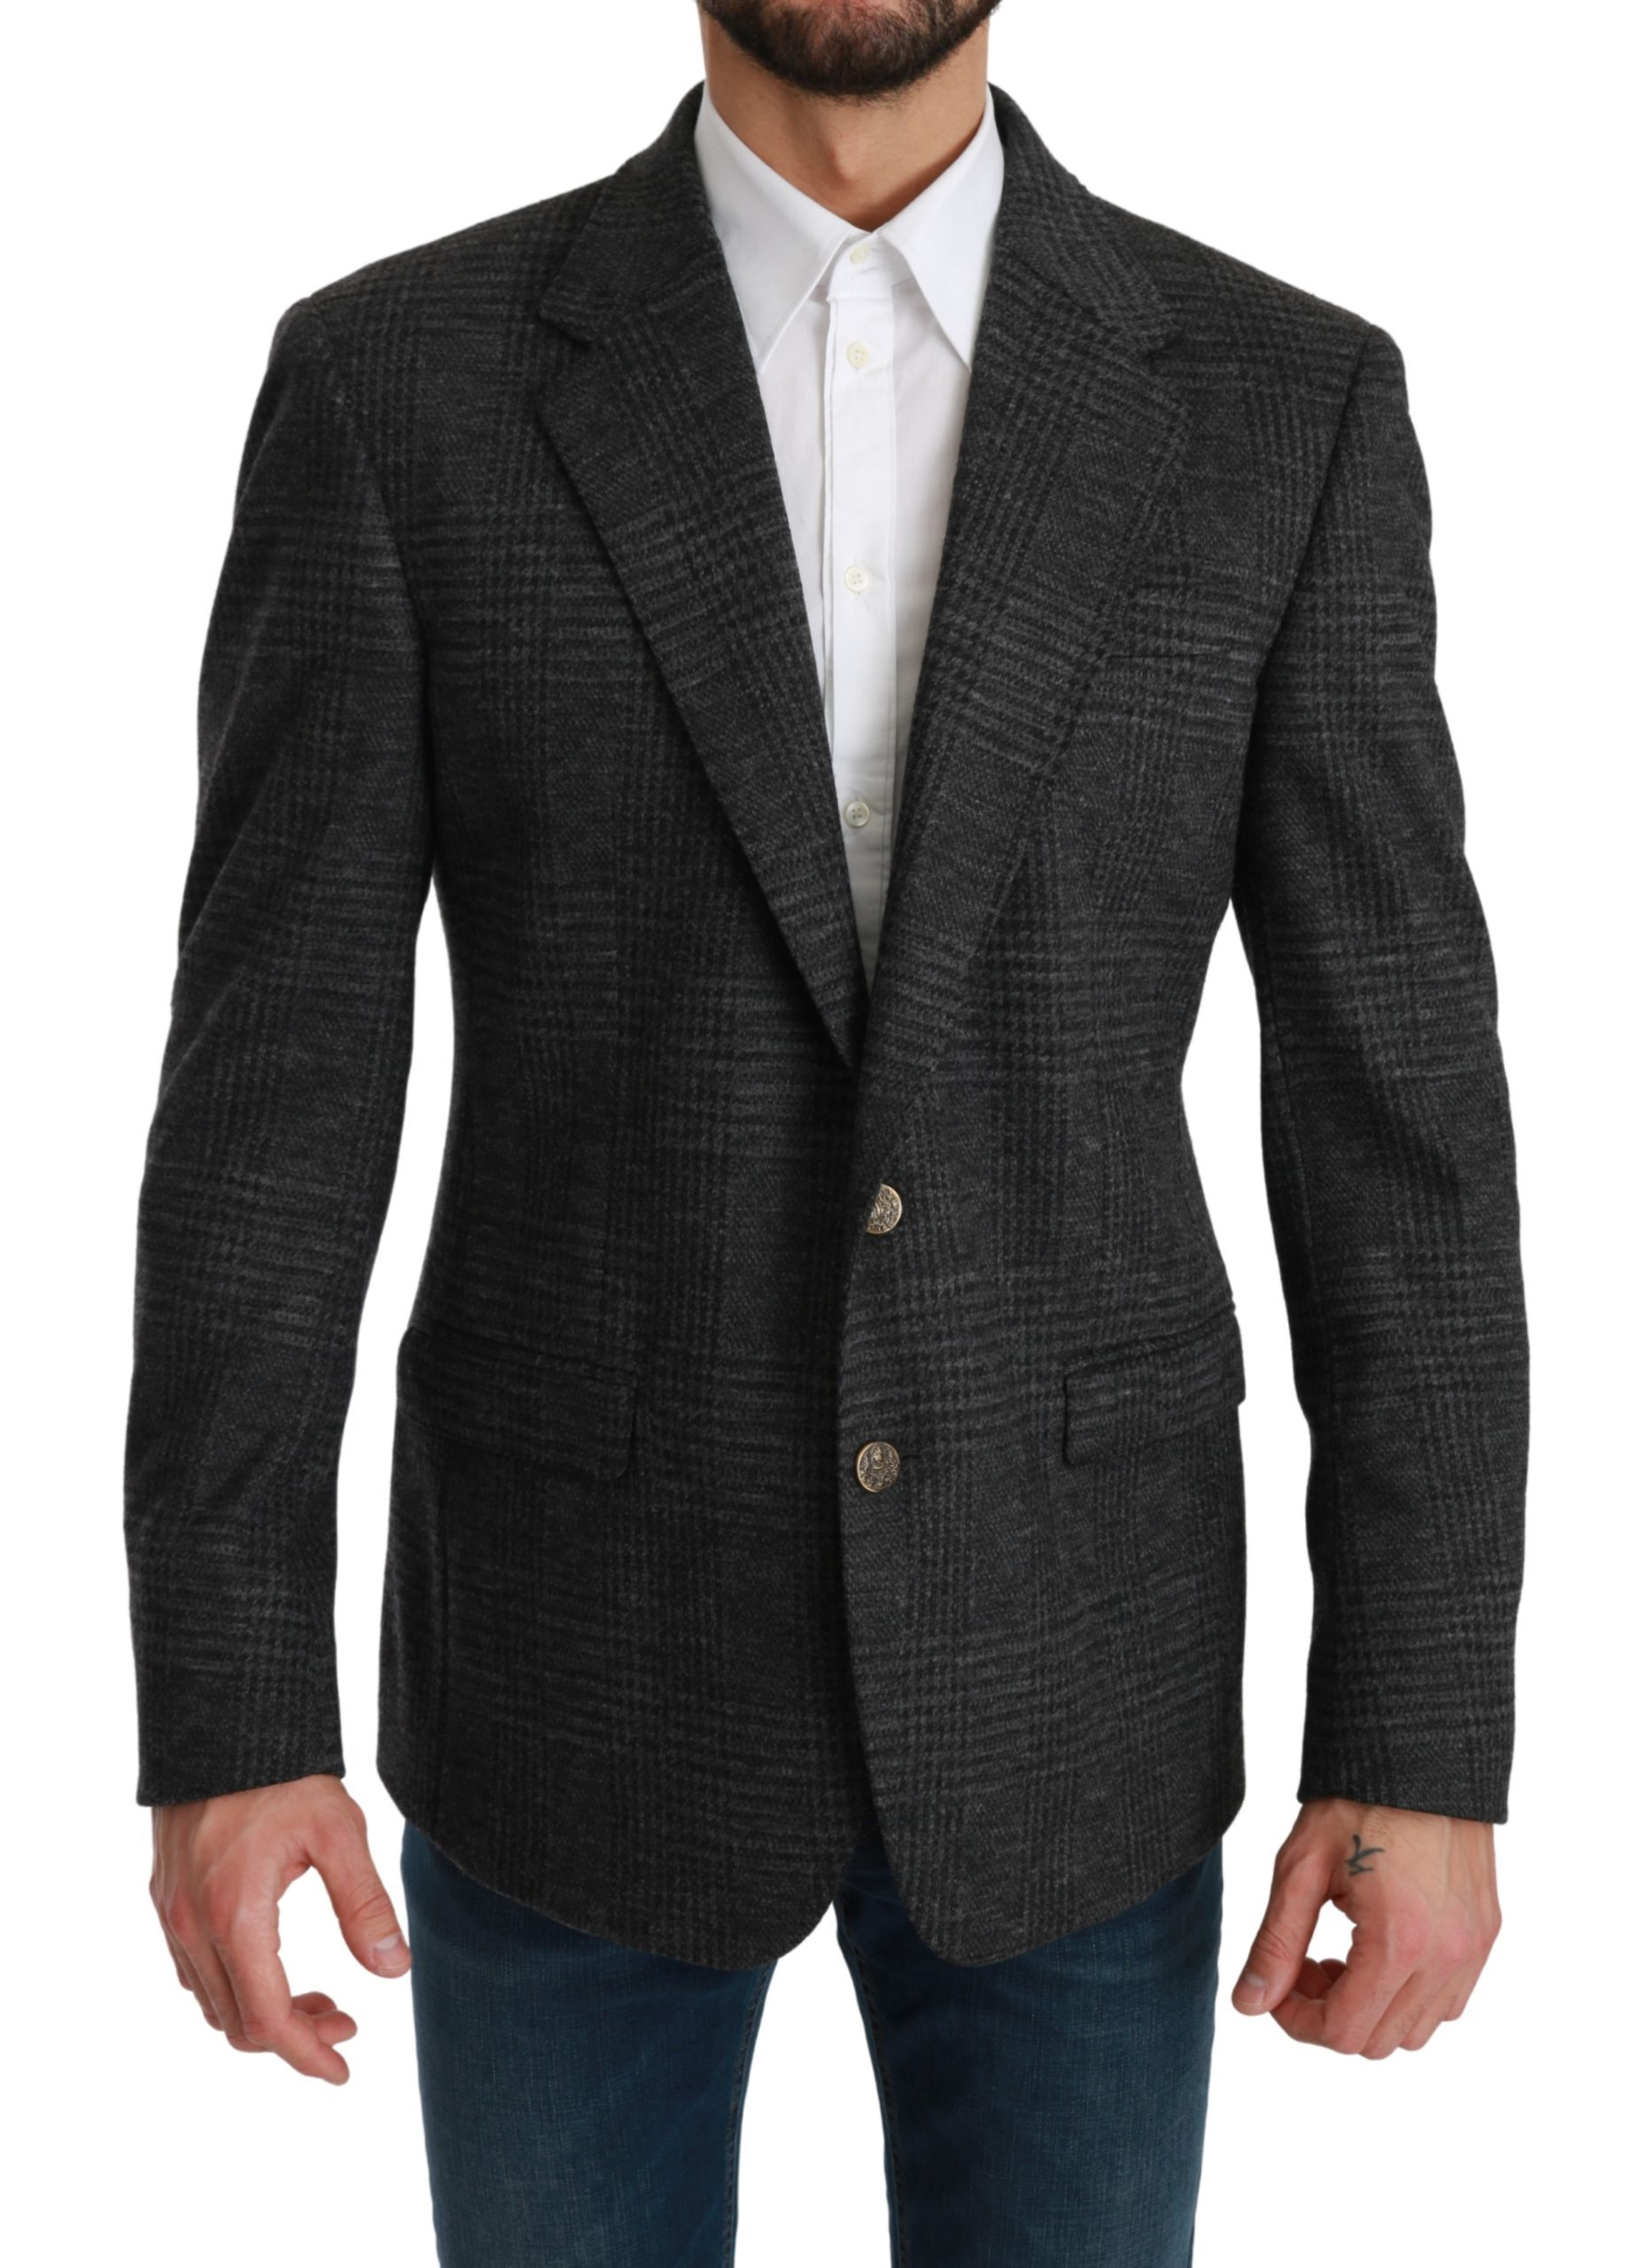 Dolce & Gabbana Men's Plaid Check Wool Formal Blazer Gray KOS1780 - IT48 | M